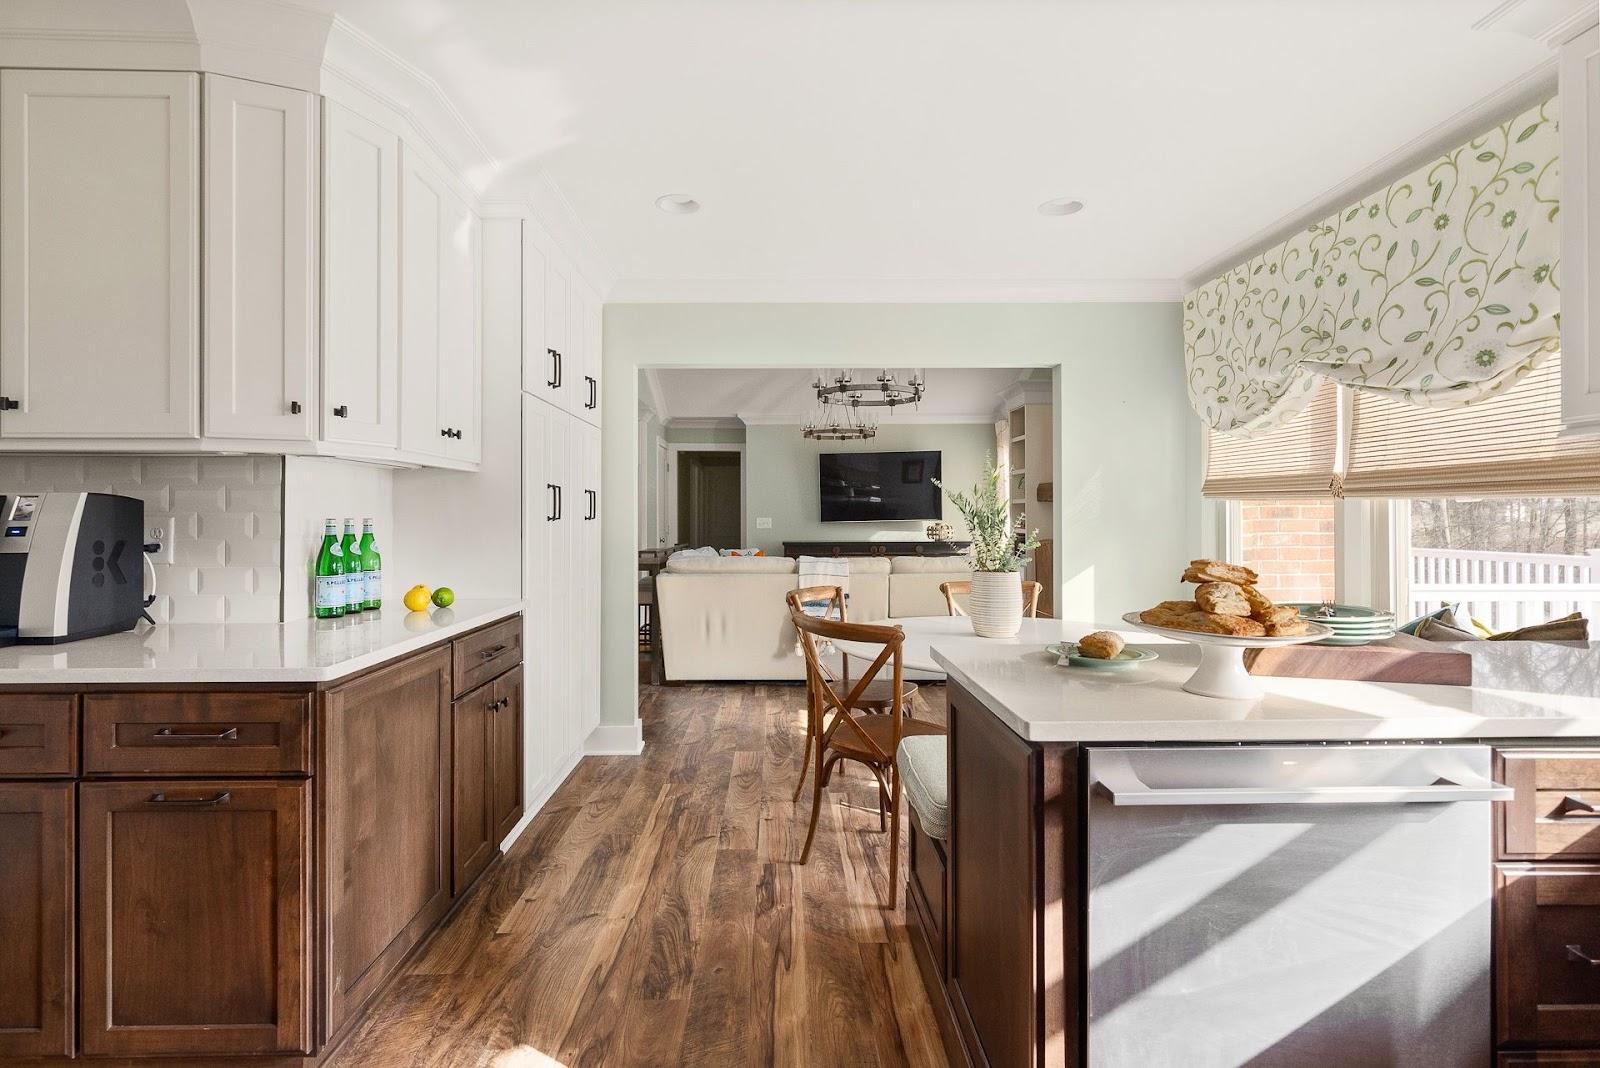 Superior construction and design Lebanon, TN 1970s Ranch Reno open concept neutral color kitchens into living area